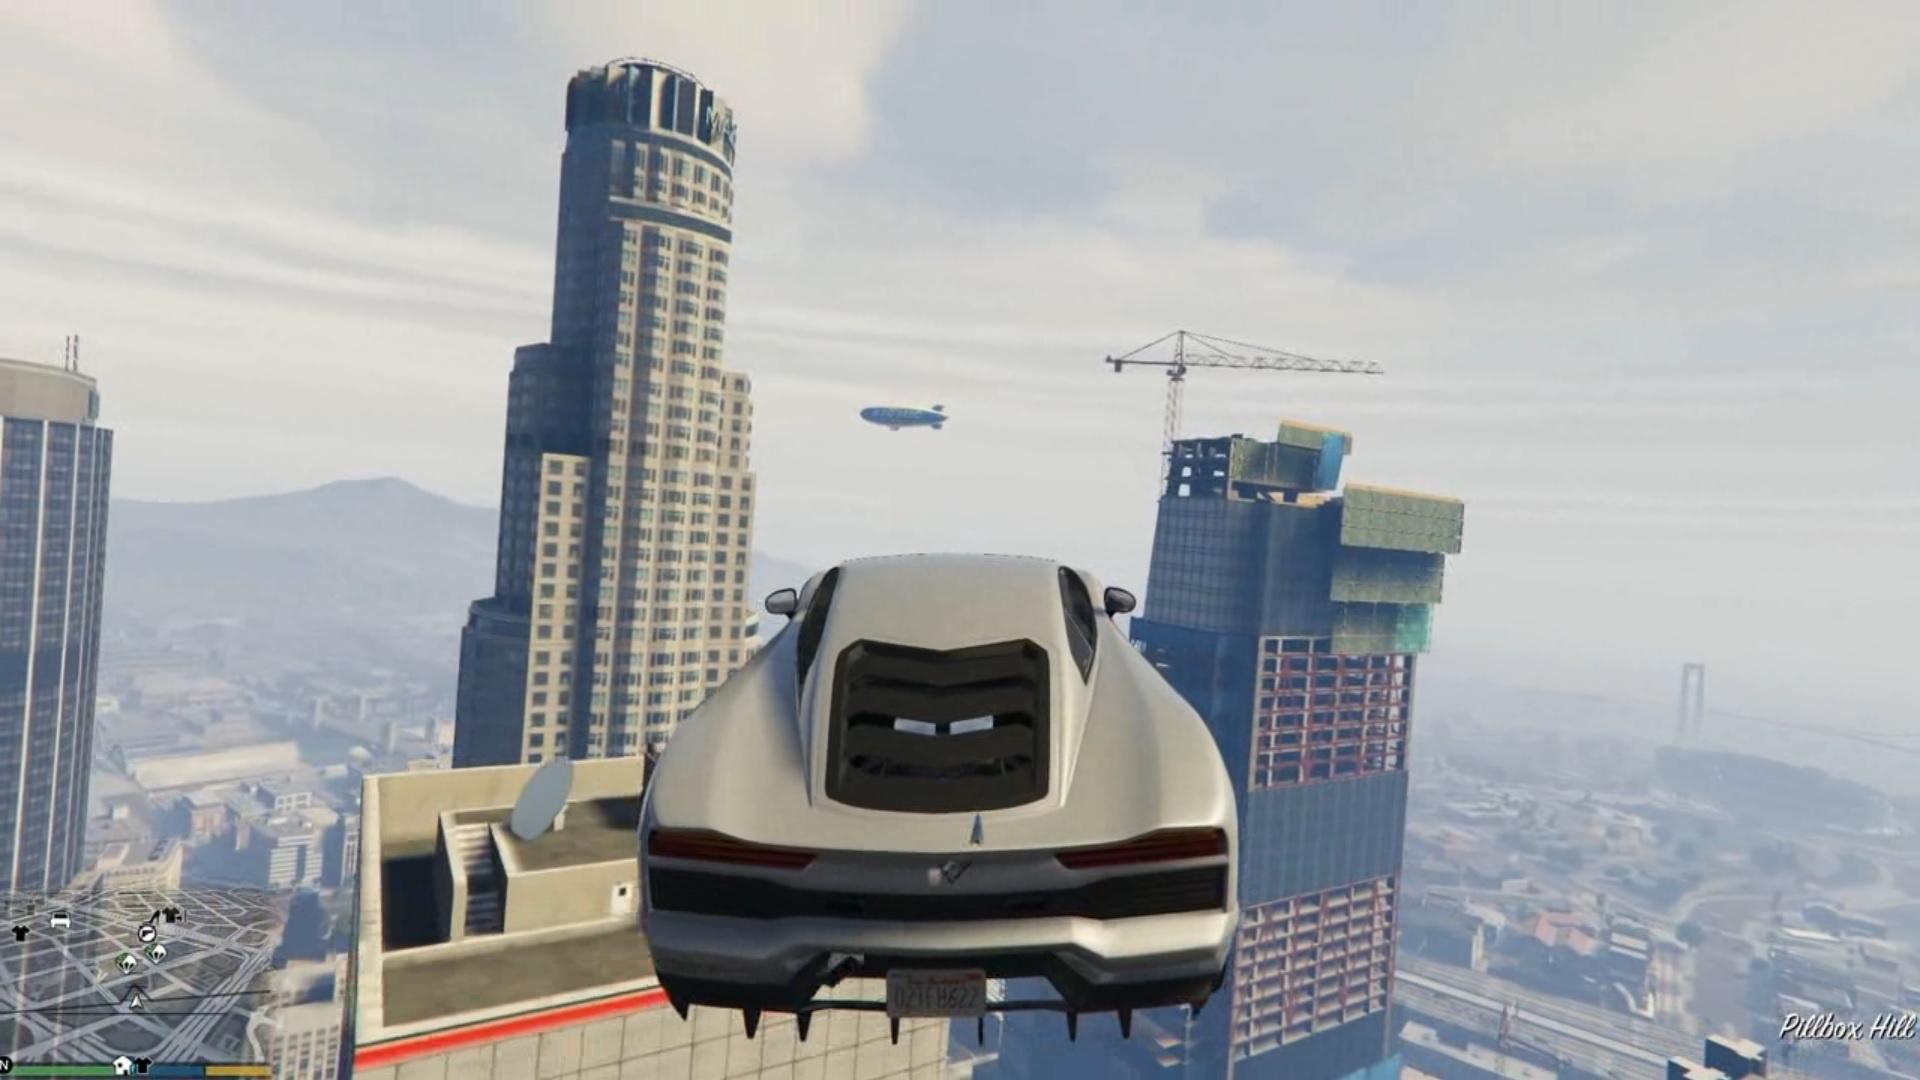 Flying Ambulance and Pegassi Vacca - GTA5-Mods.com